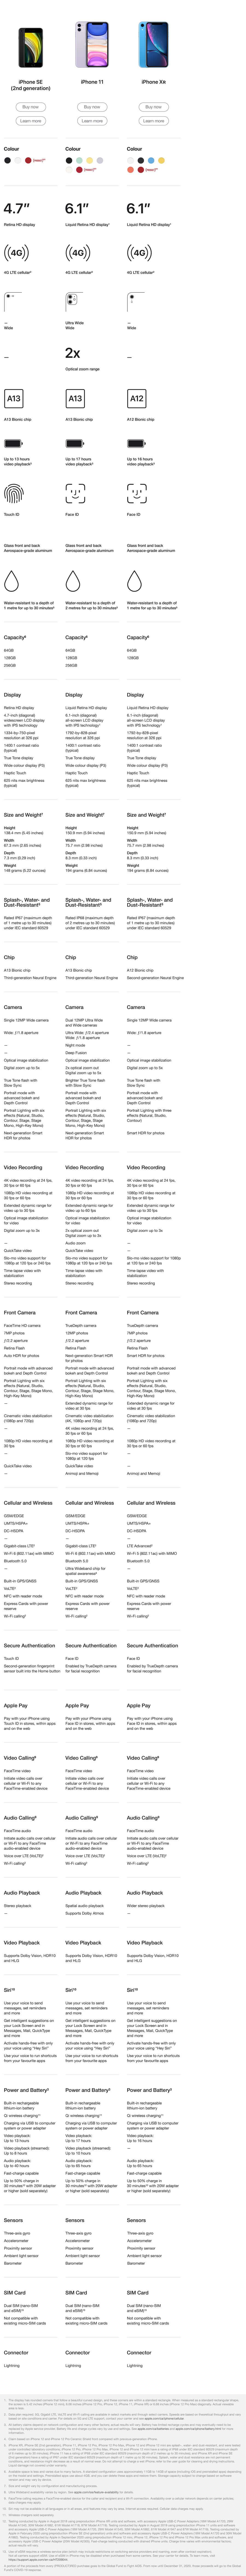 iPhone 12 Compare 2